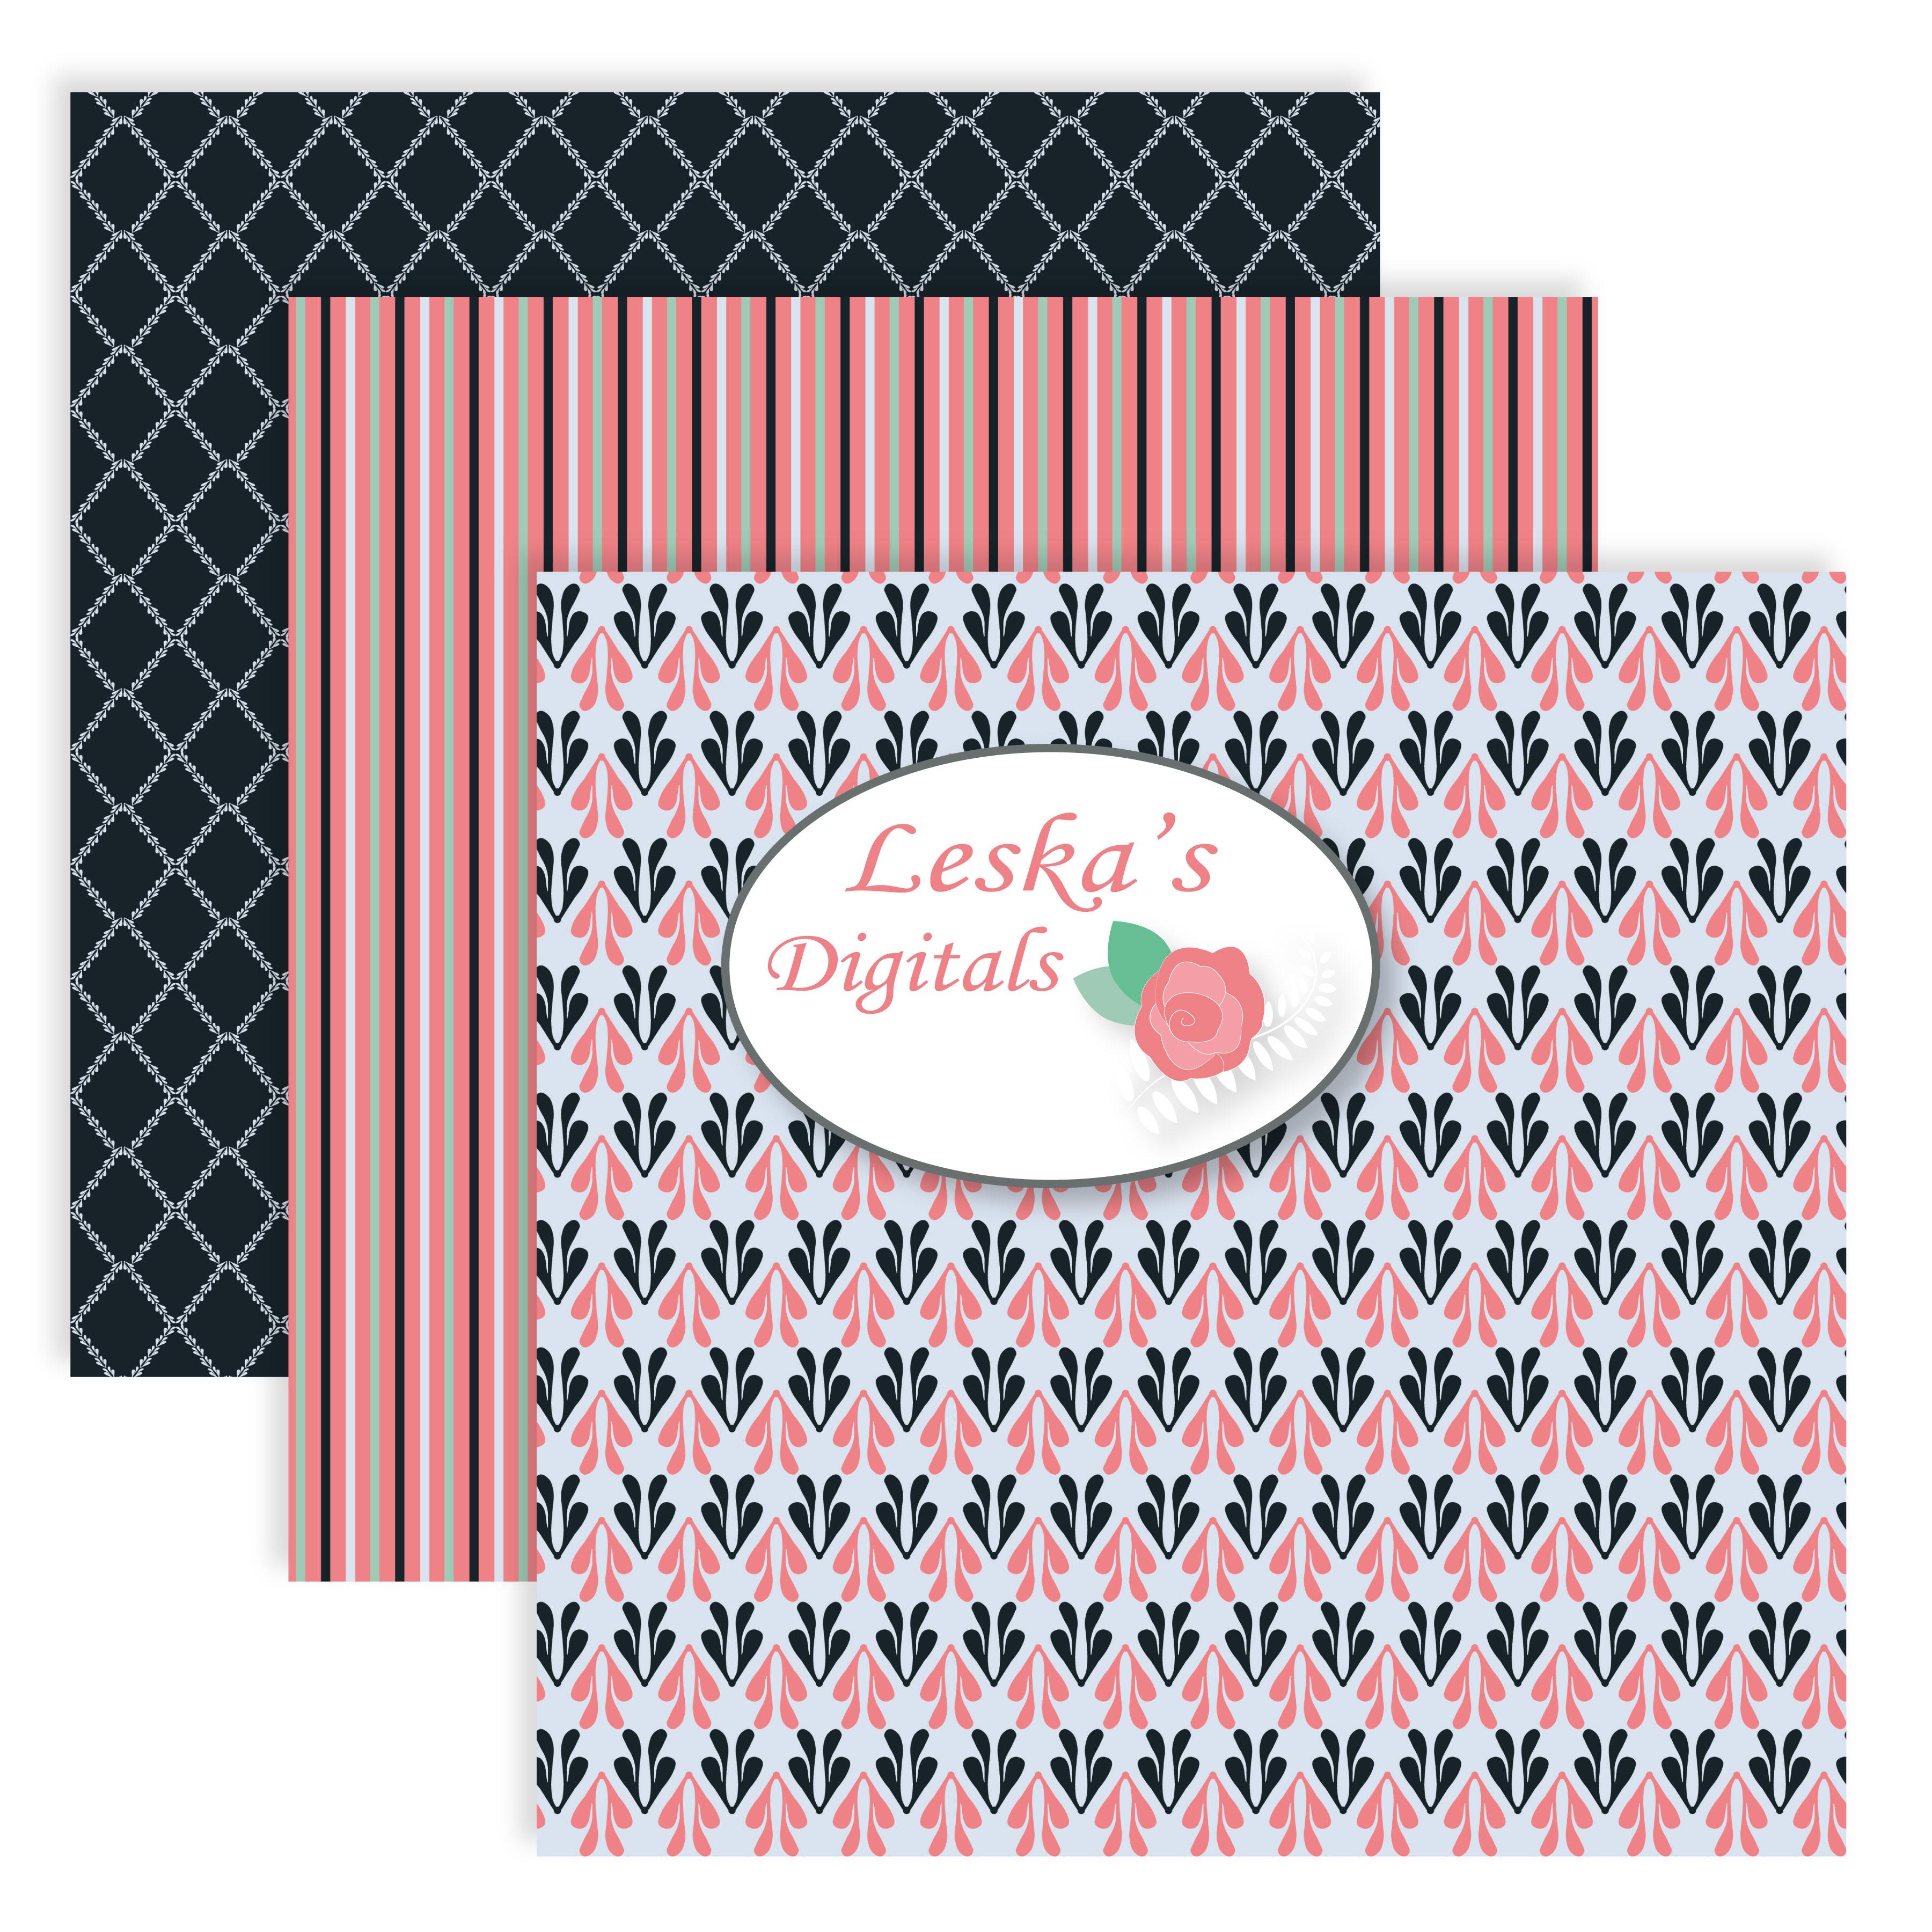 Digital Scrapbook Paper example image 4